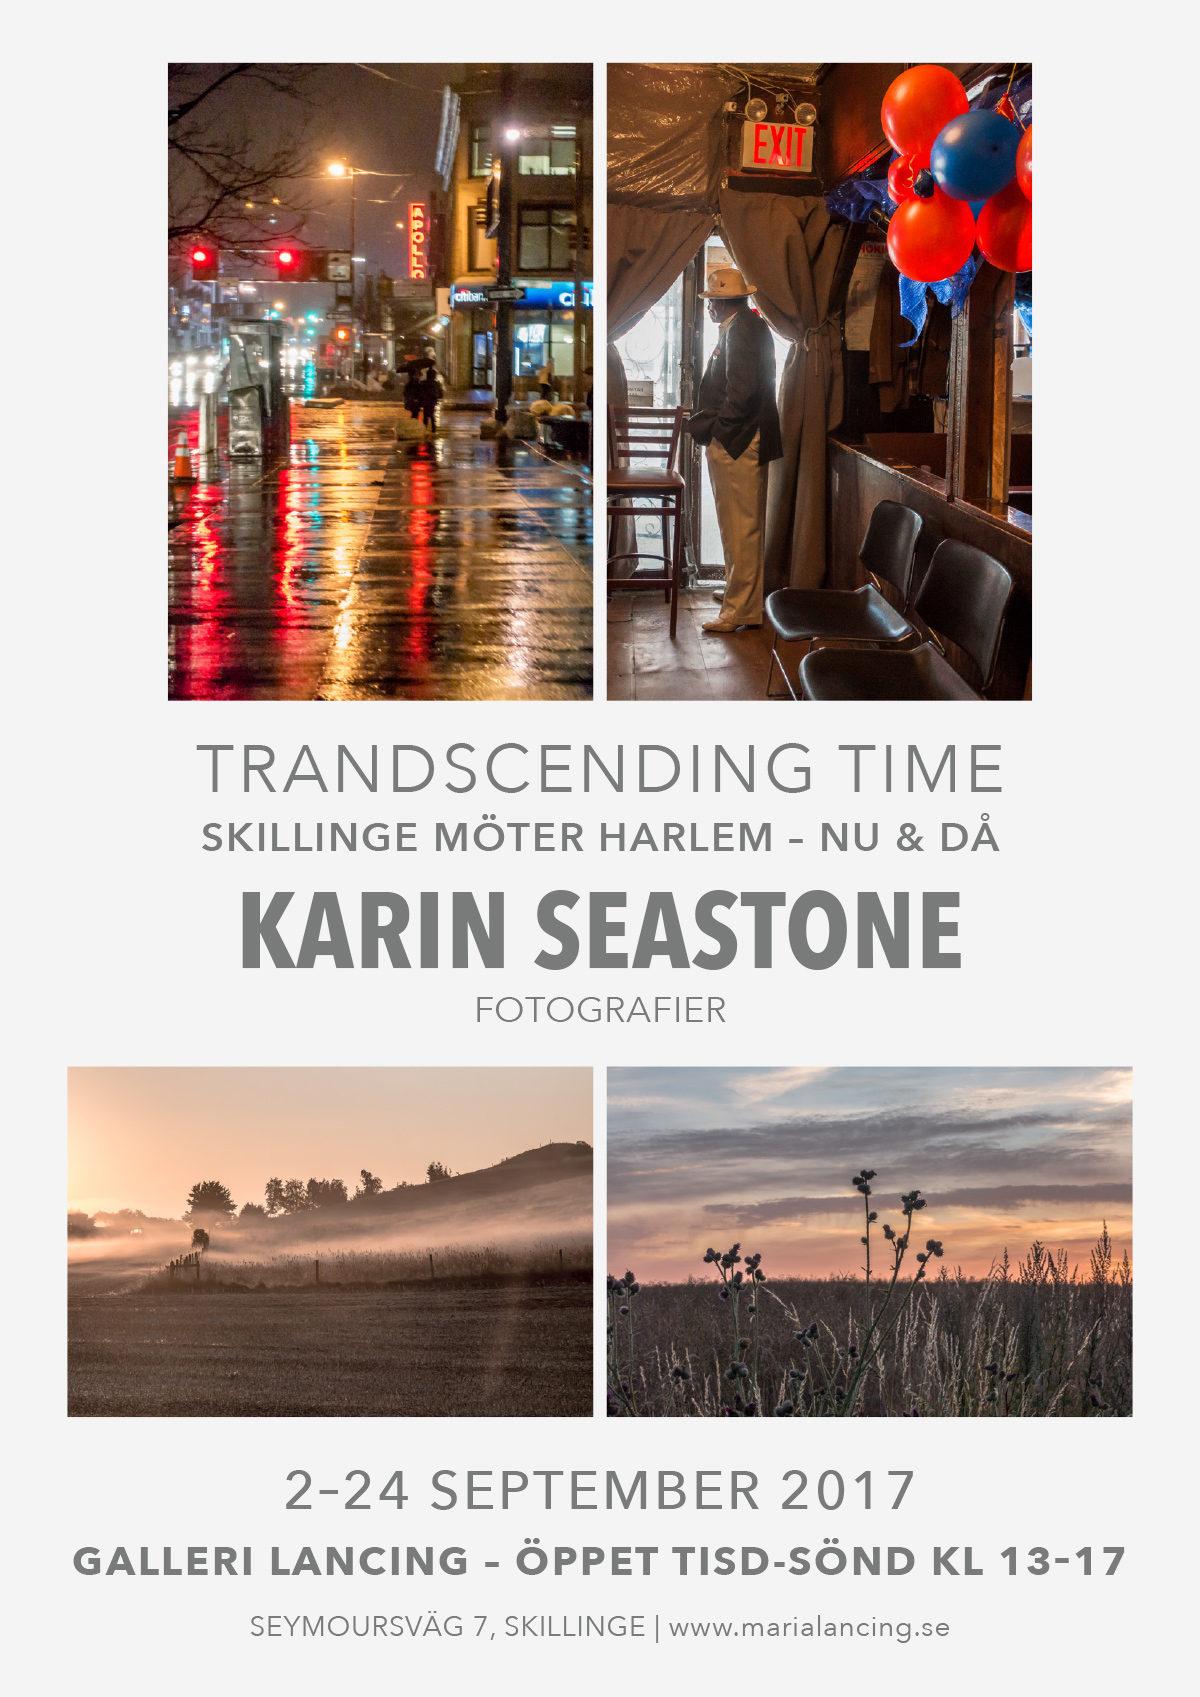 Karin Seastone fotografier